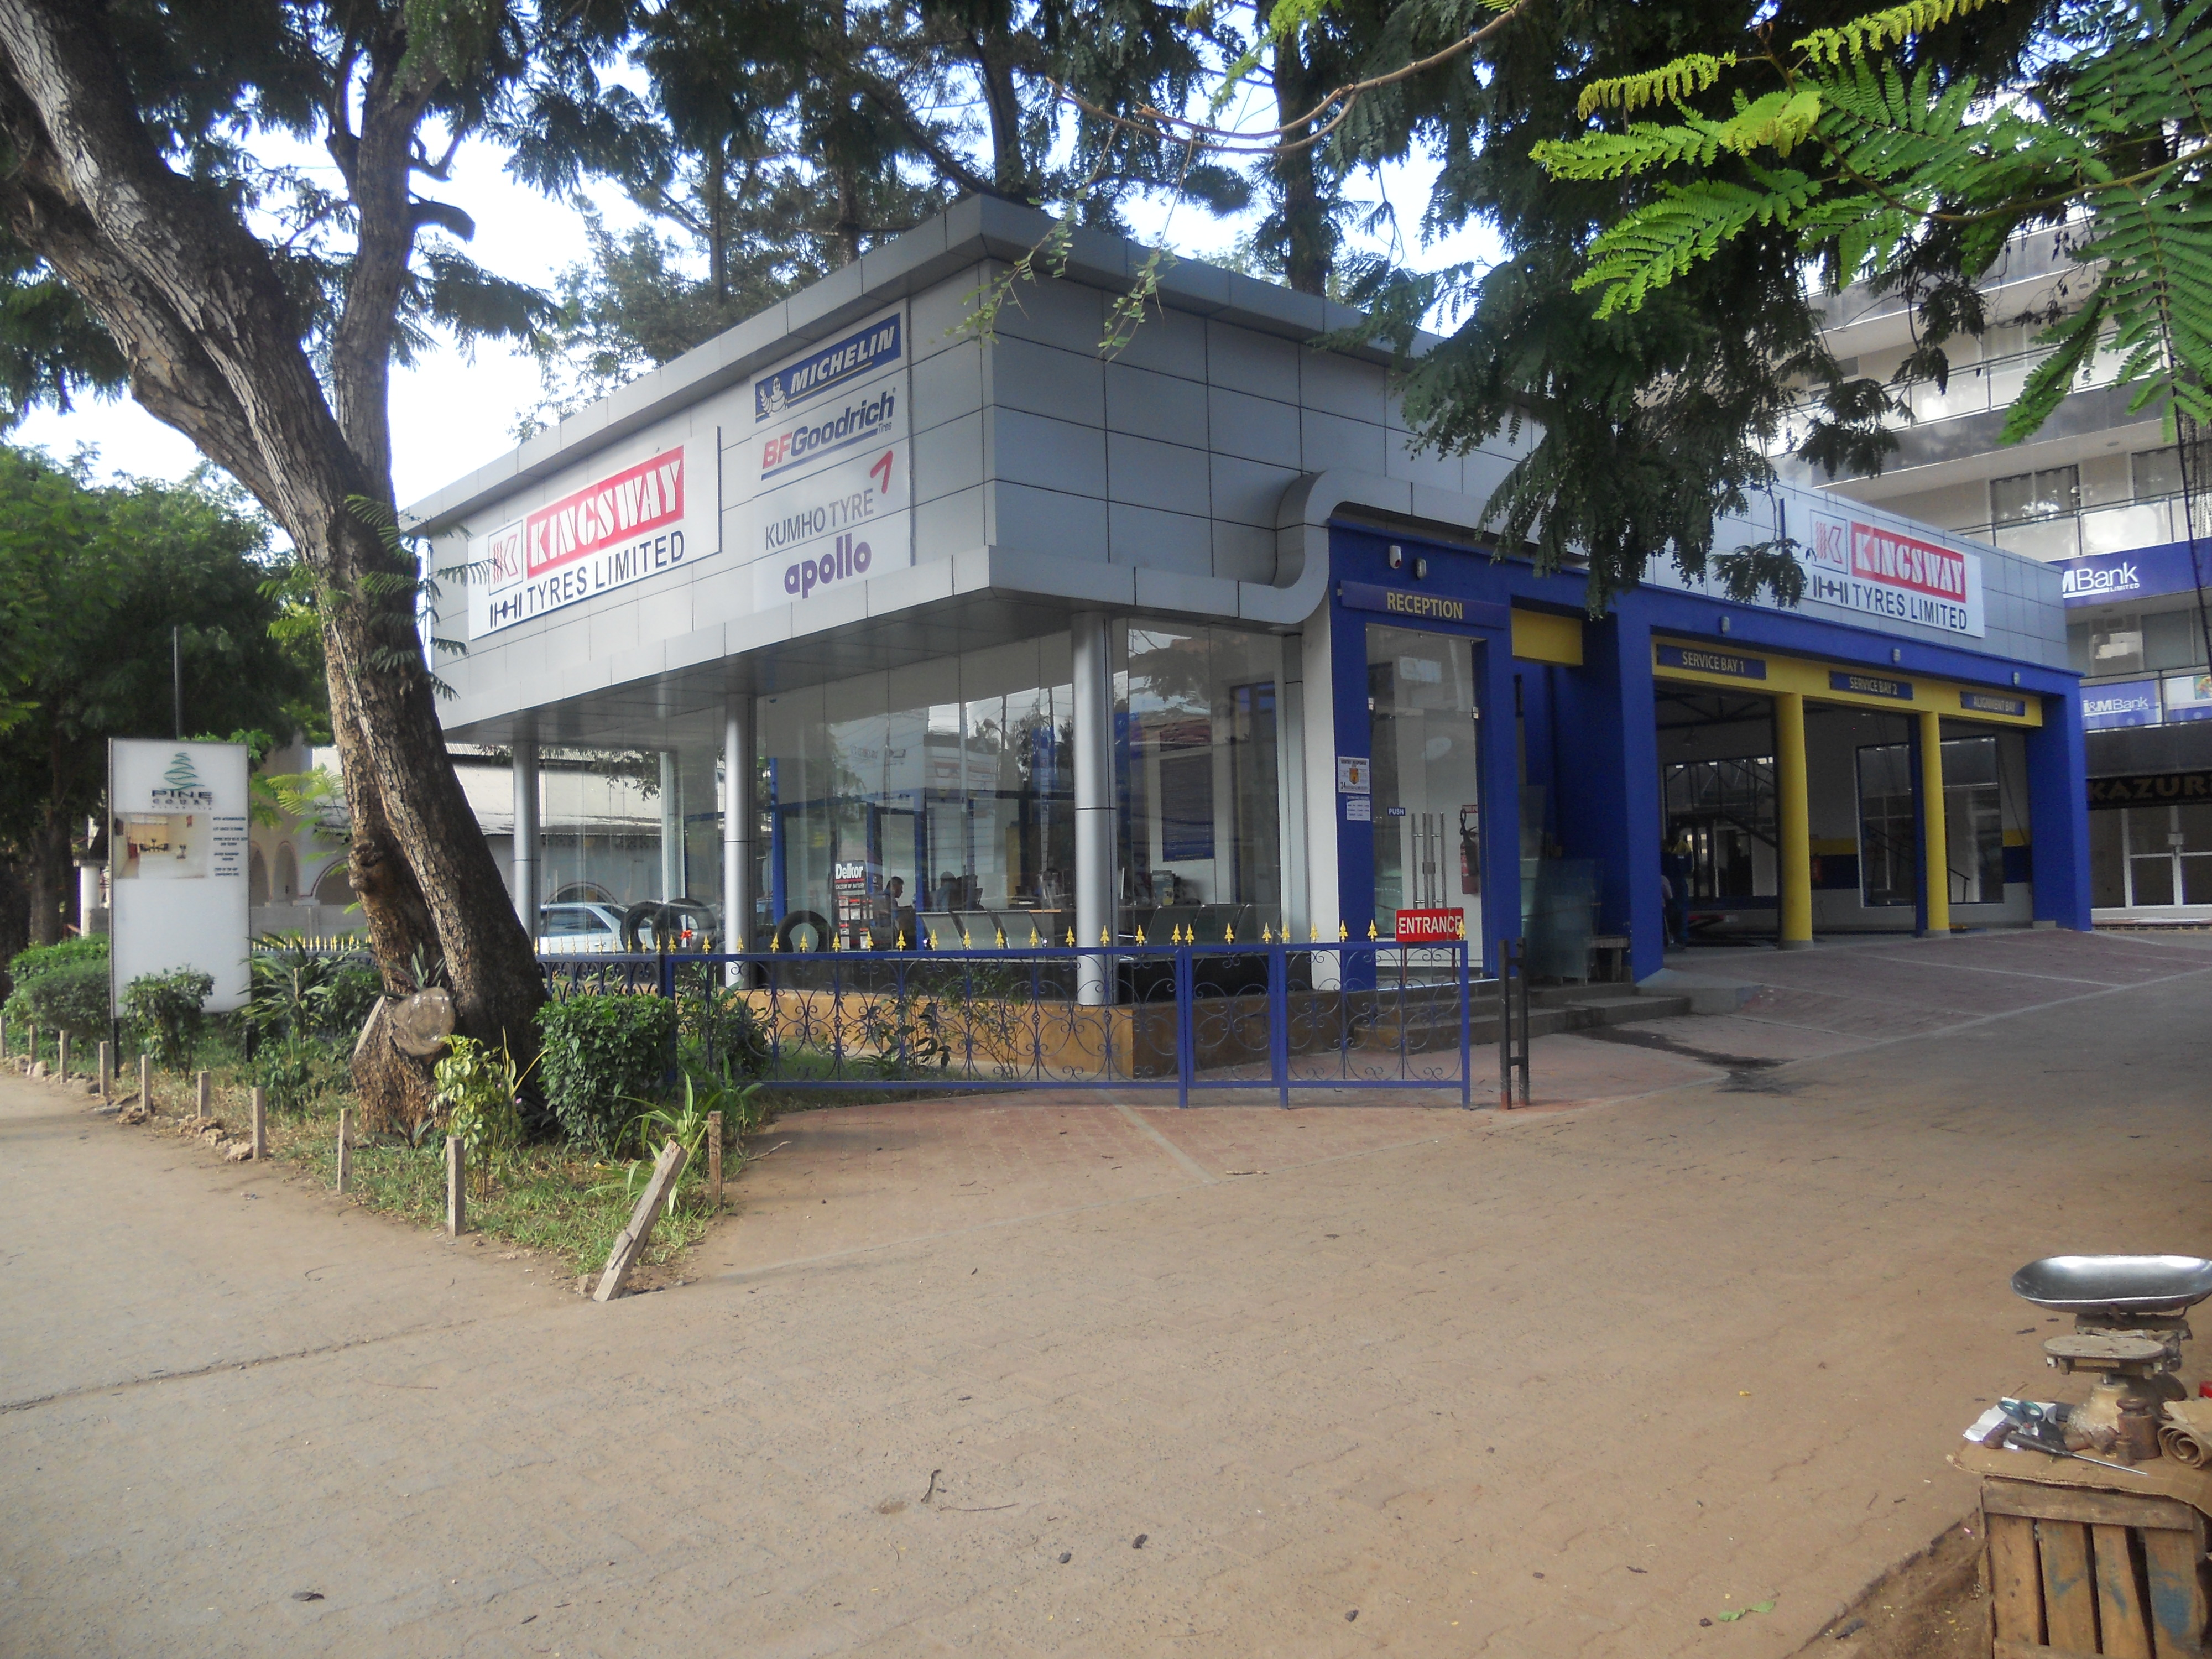 Kingsway Tyres - Malindi